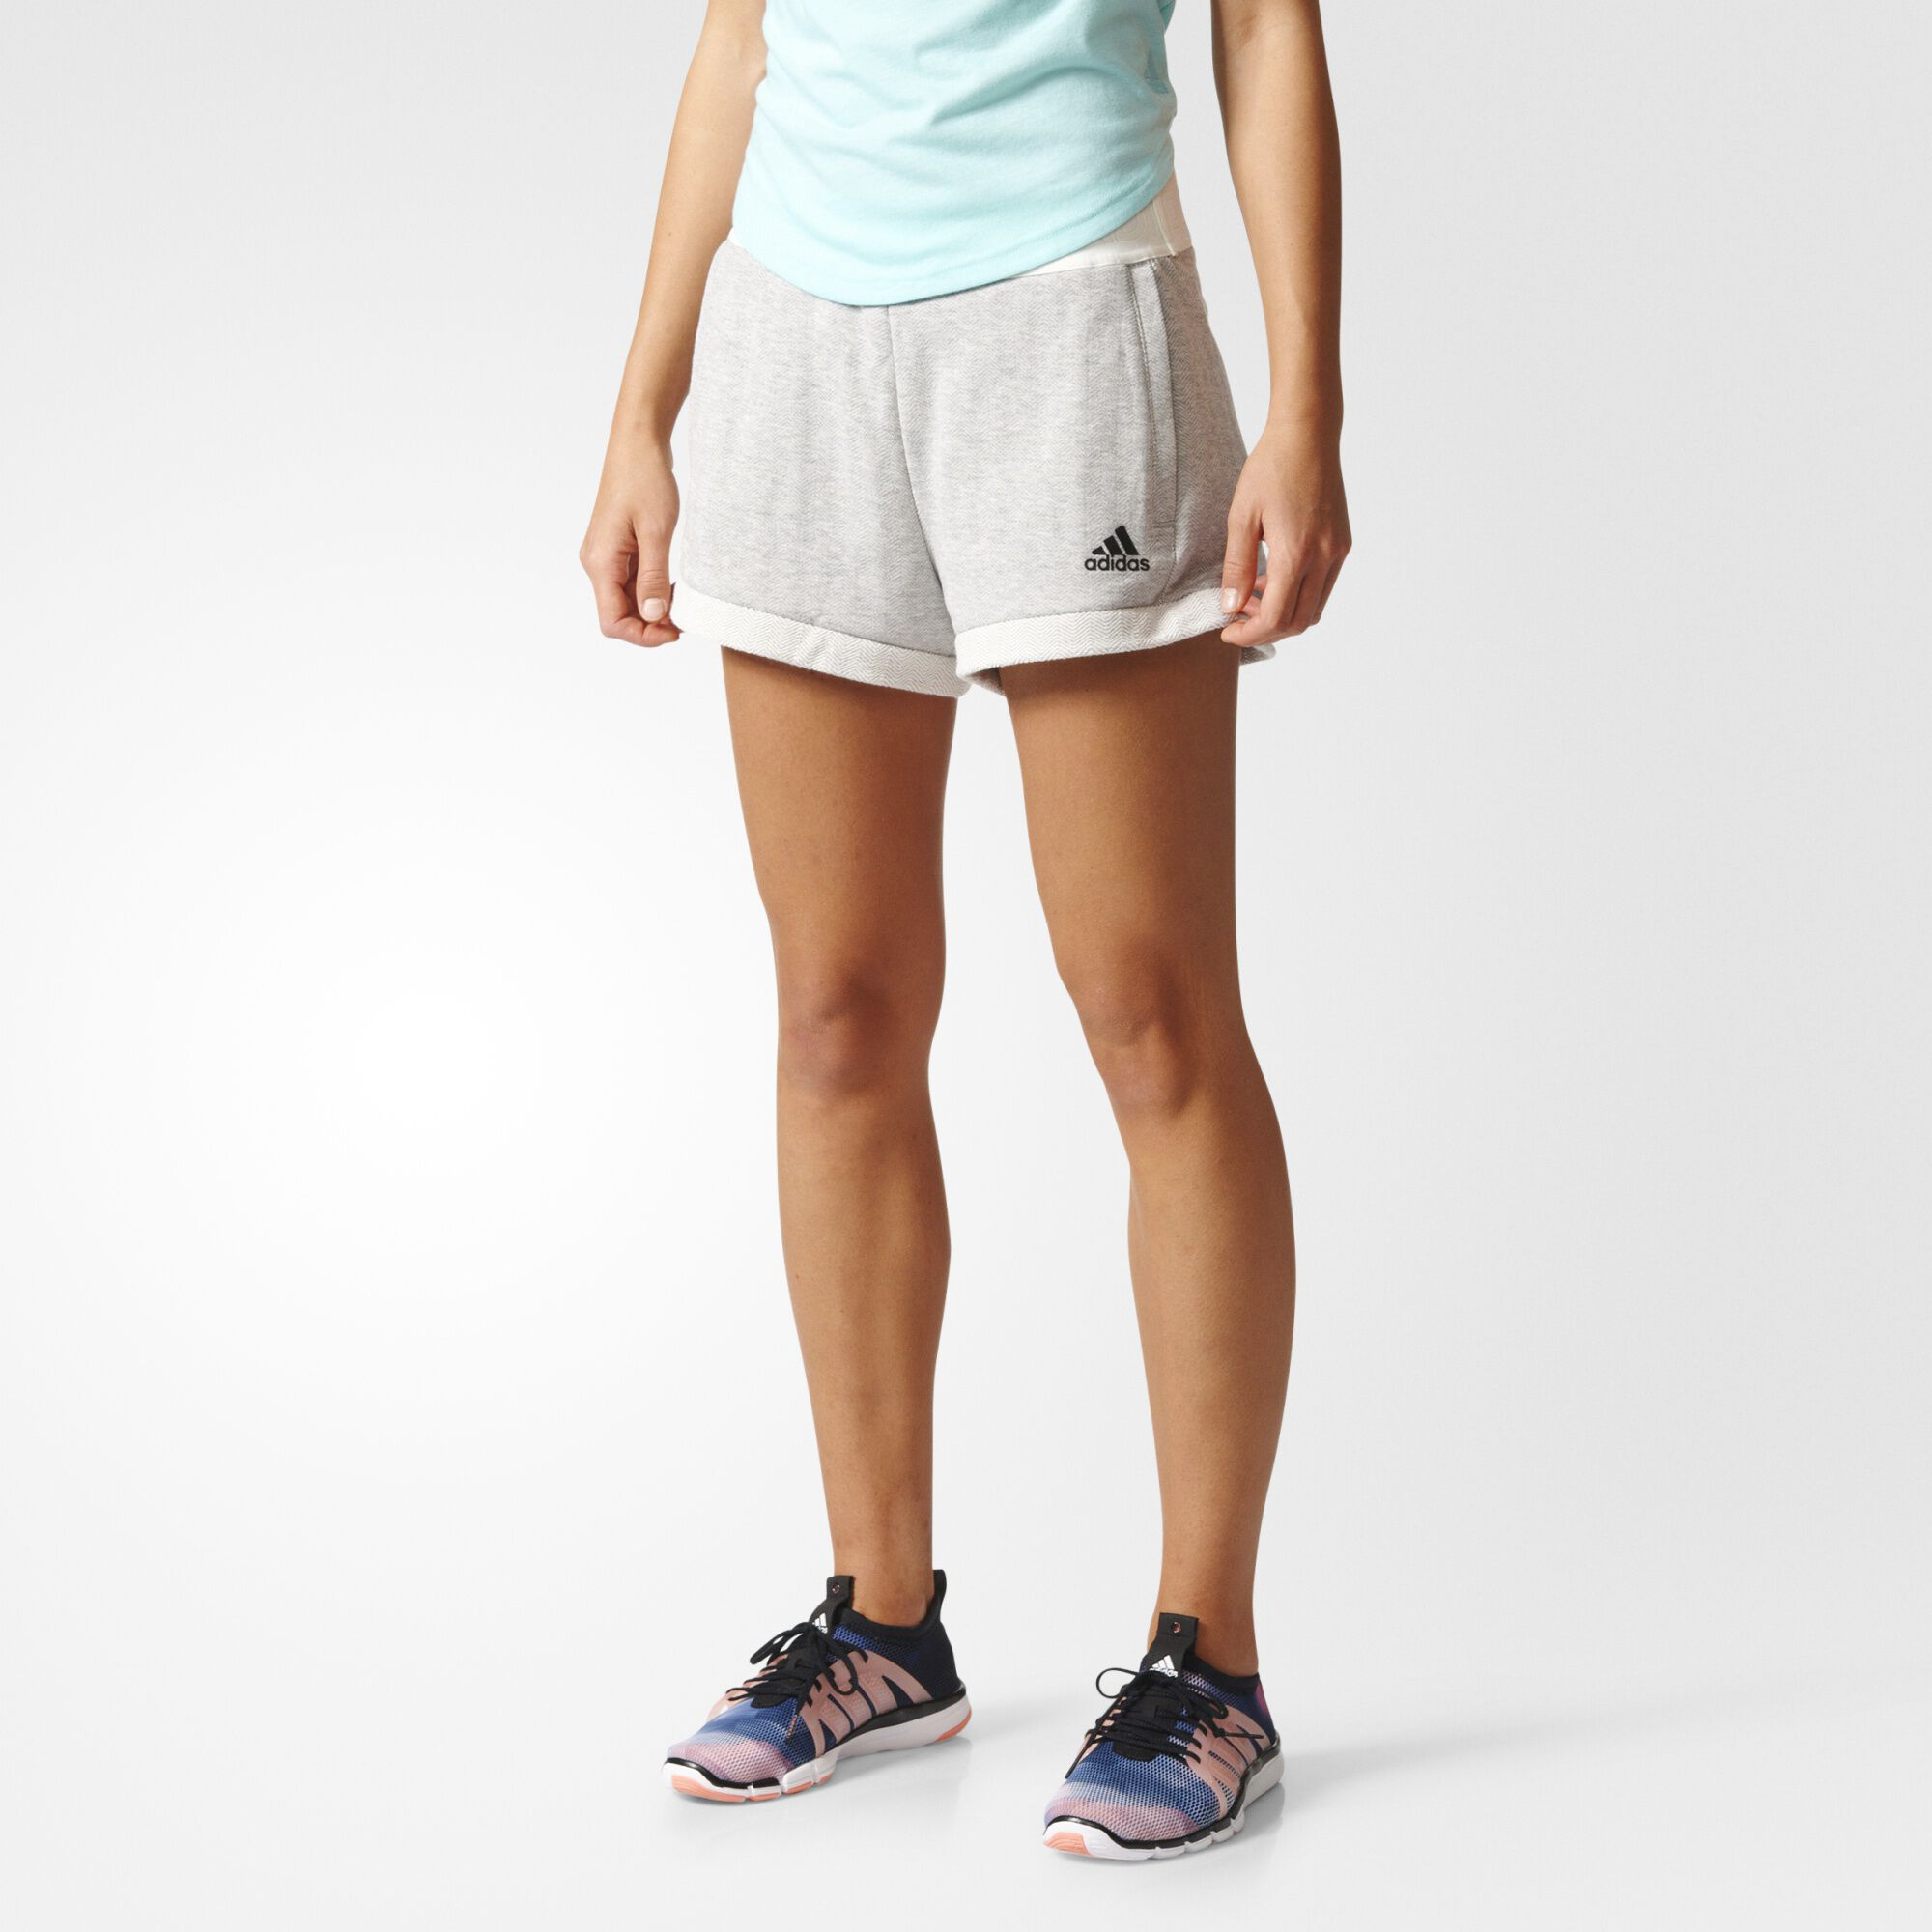 adidas short femme